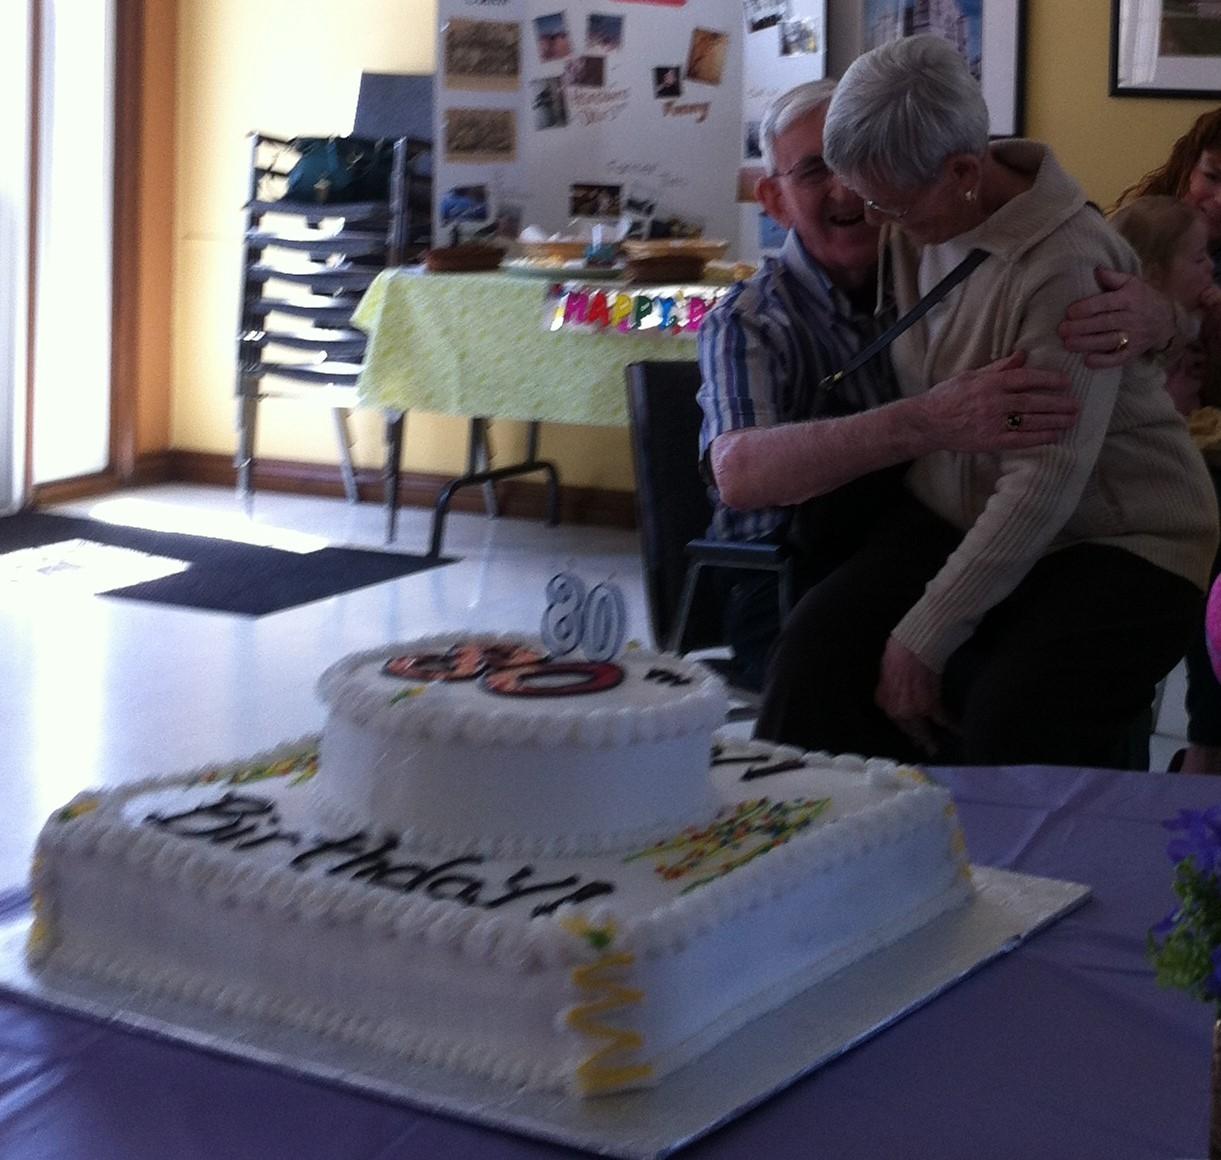 80th Dad, cake and Doreen.JPG